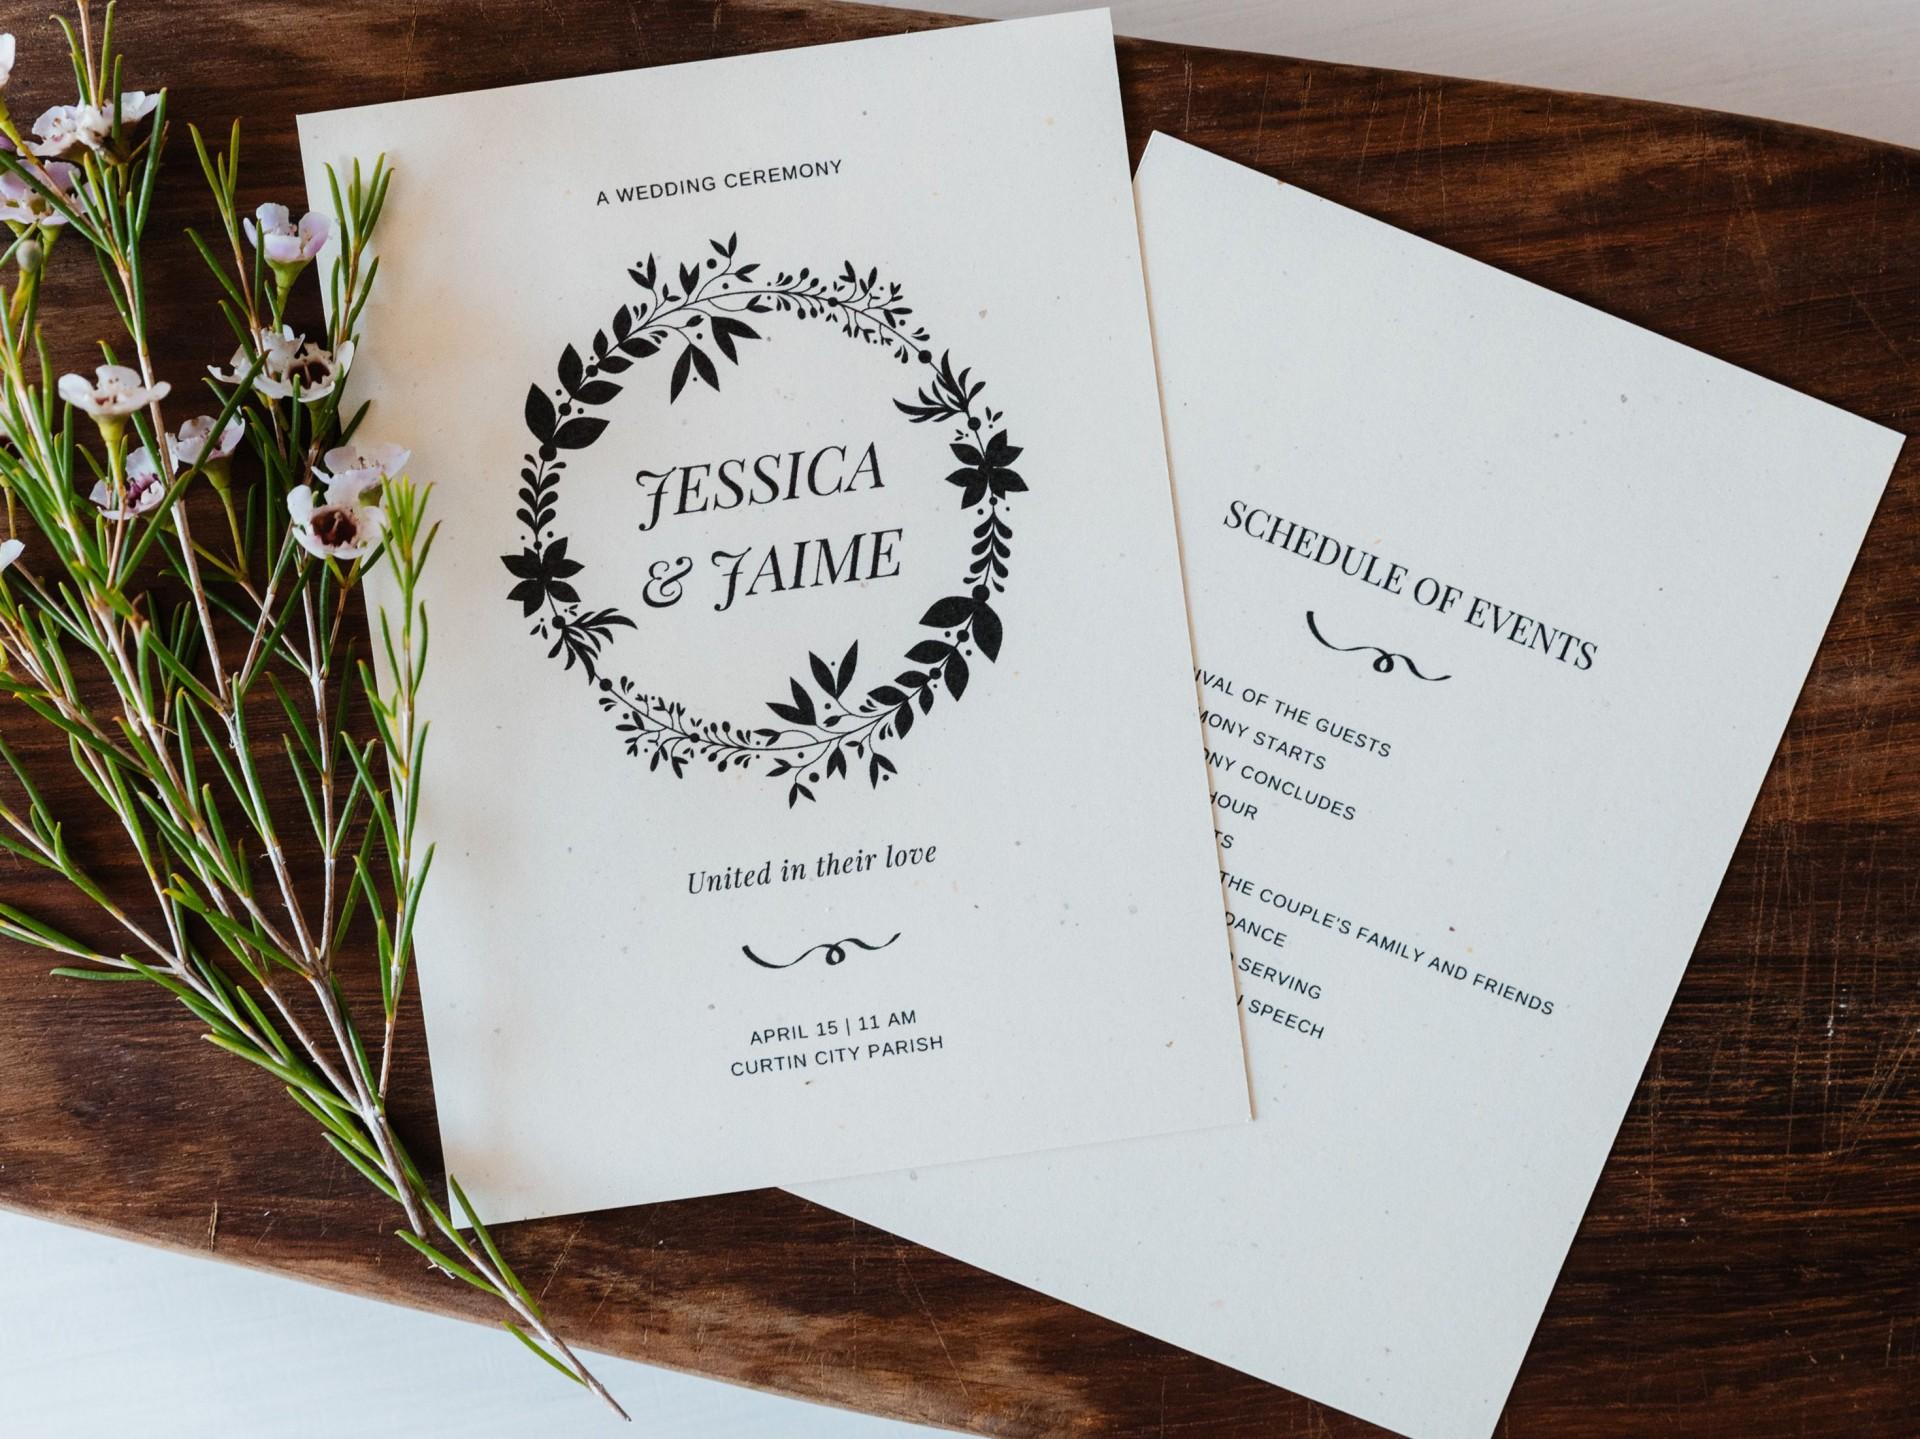 008 Fascinating Free Word Template For Wedding Program Inspiration  Programs1920